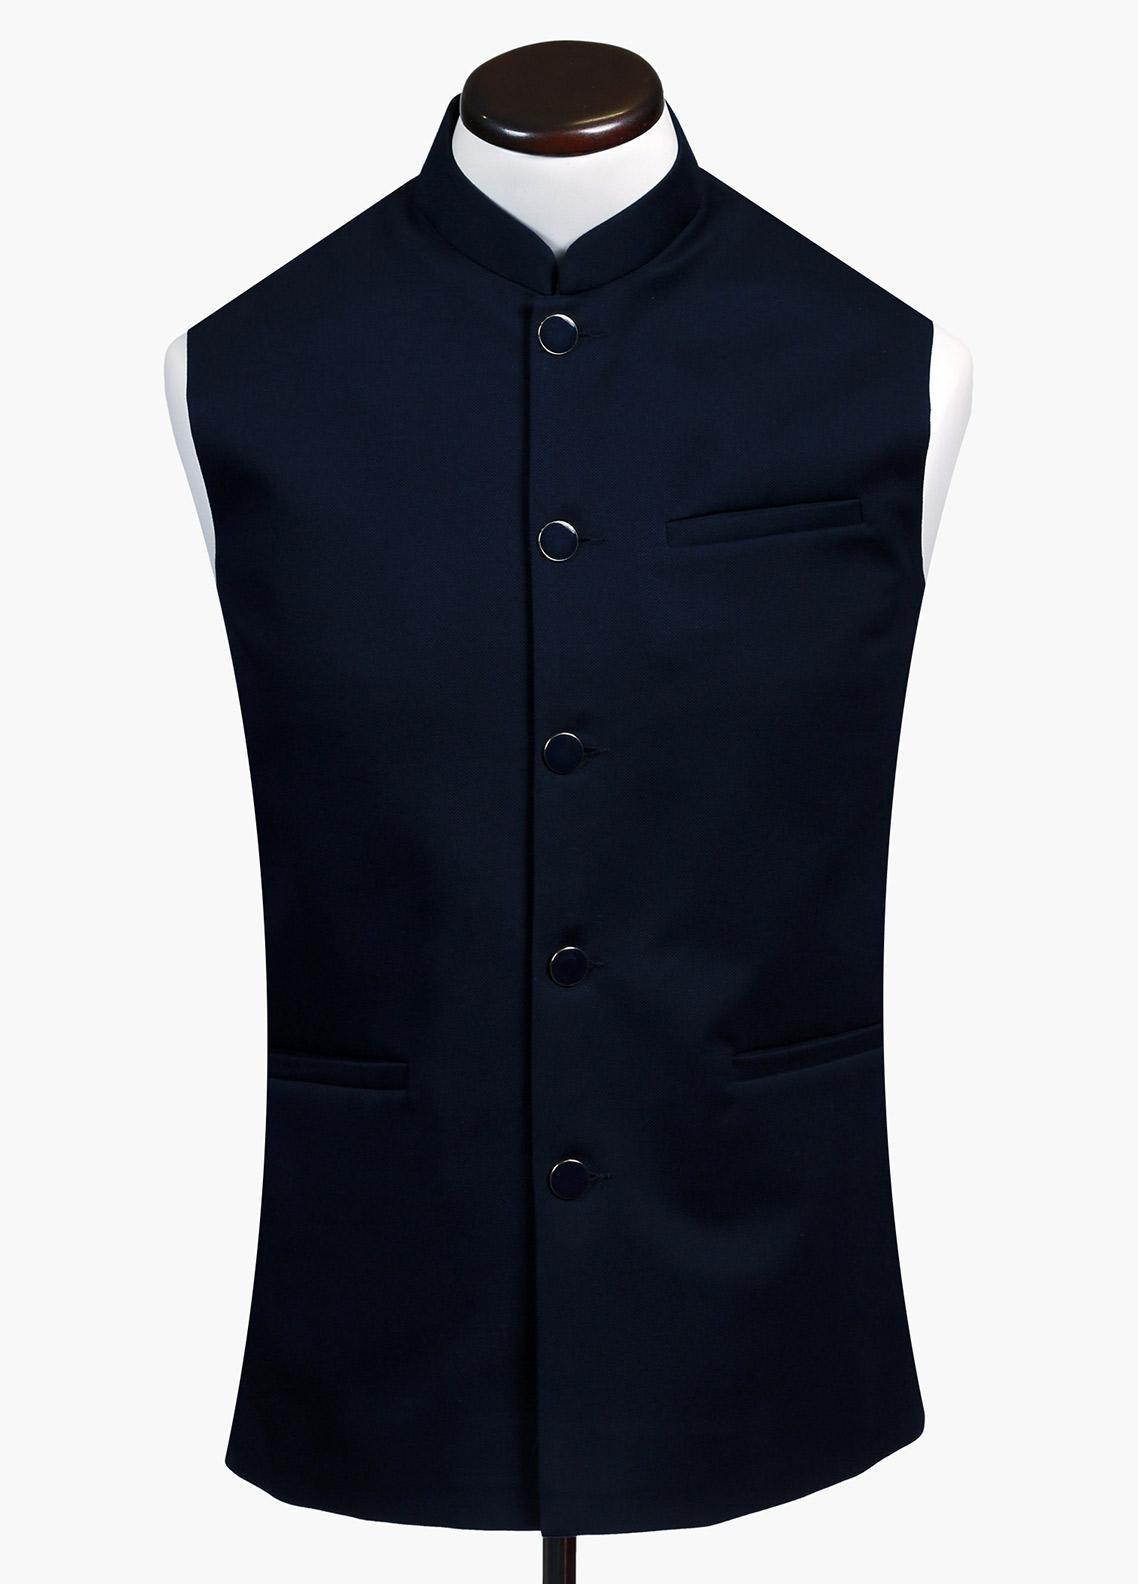 Brumano Cotton Formal Waistcoat for Men - Navy Blue BRM-748